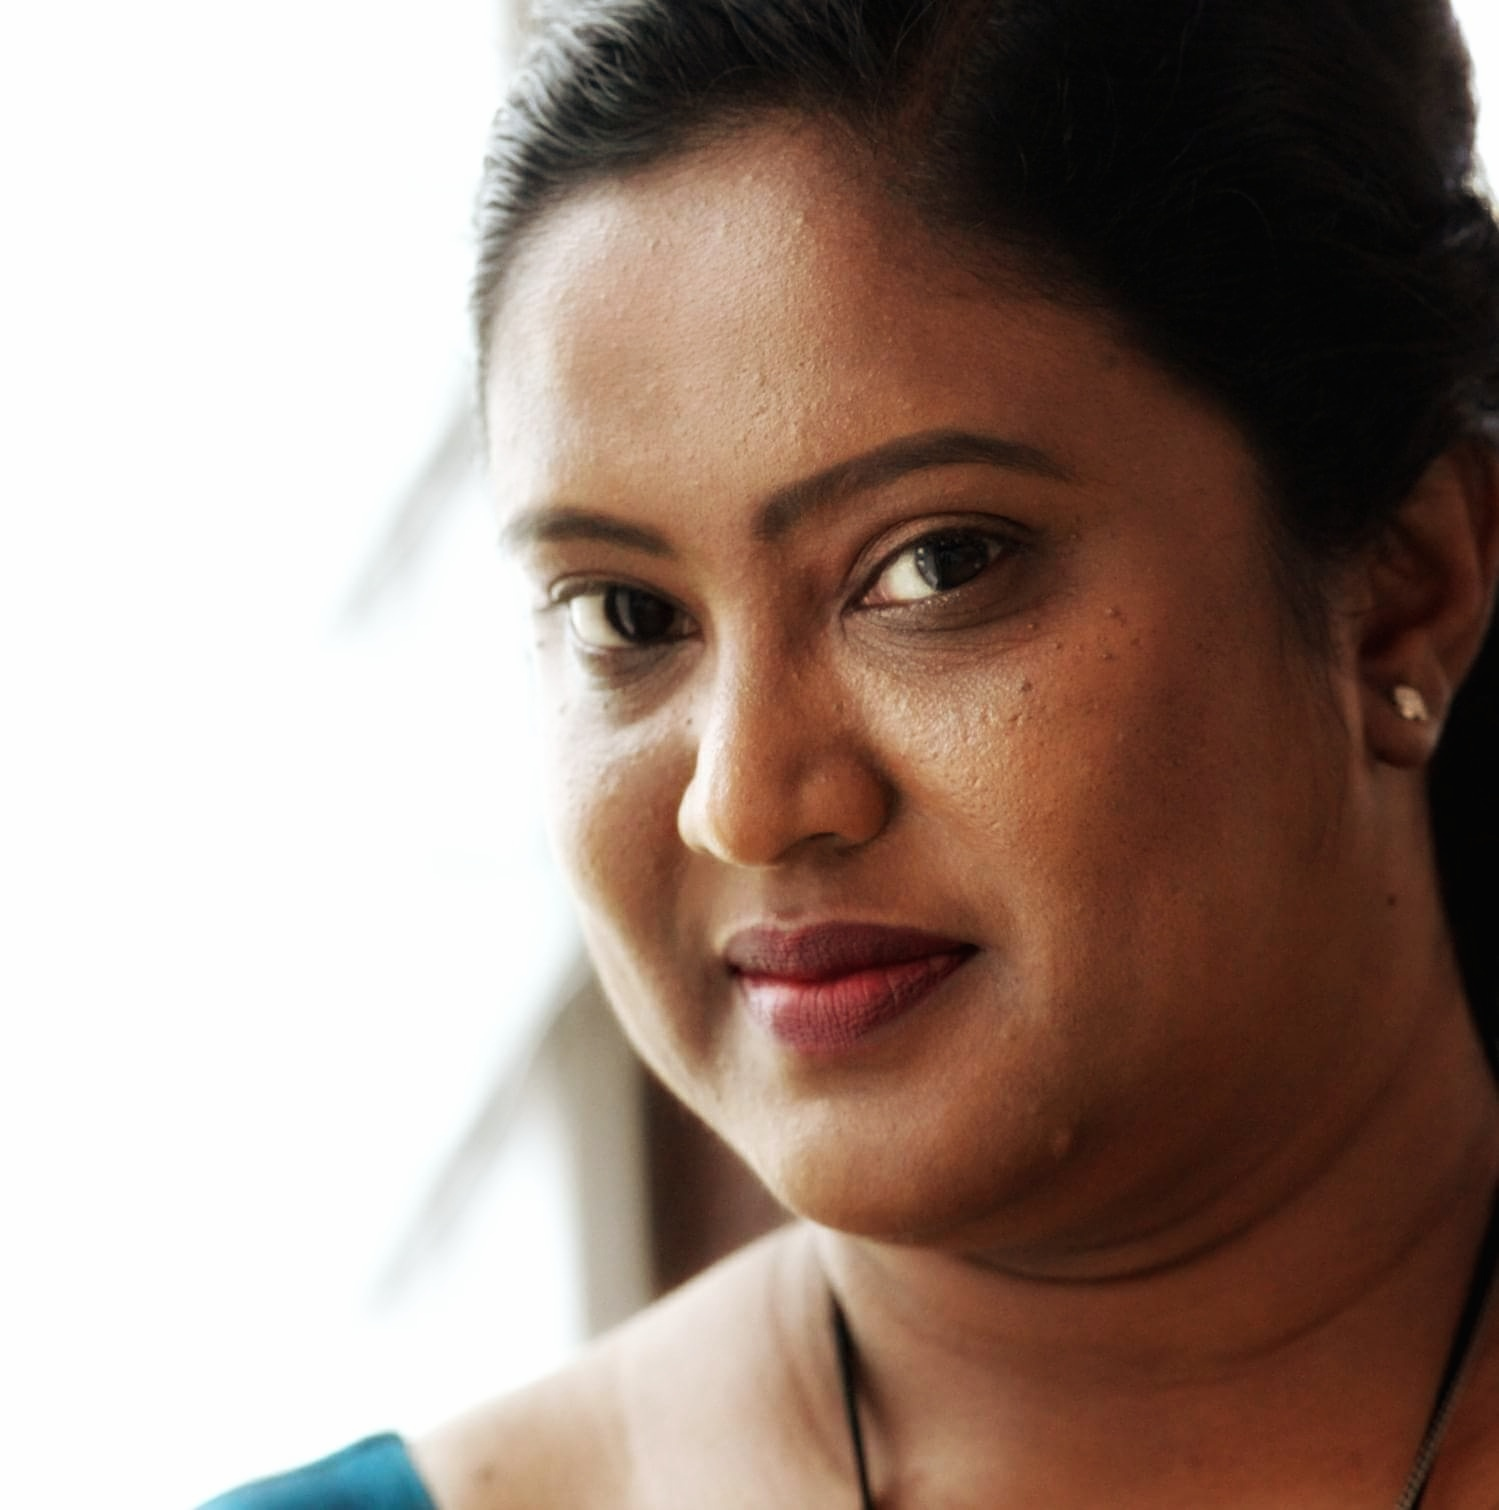 WRITER KATHYANA AMARASINGHA